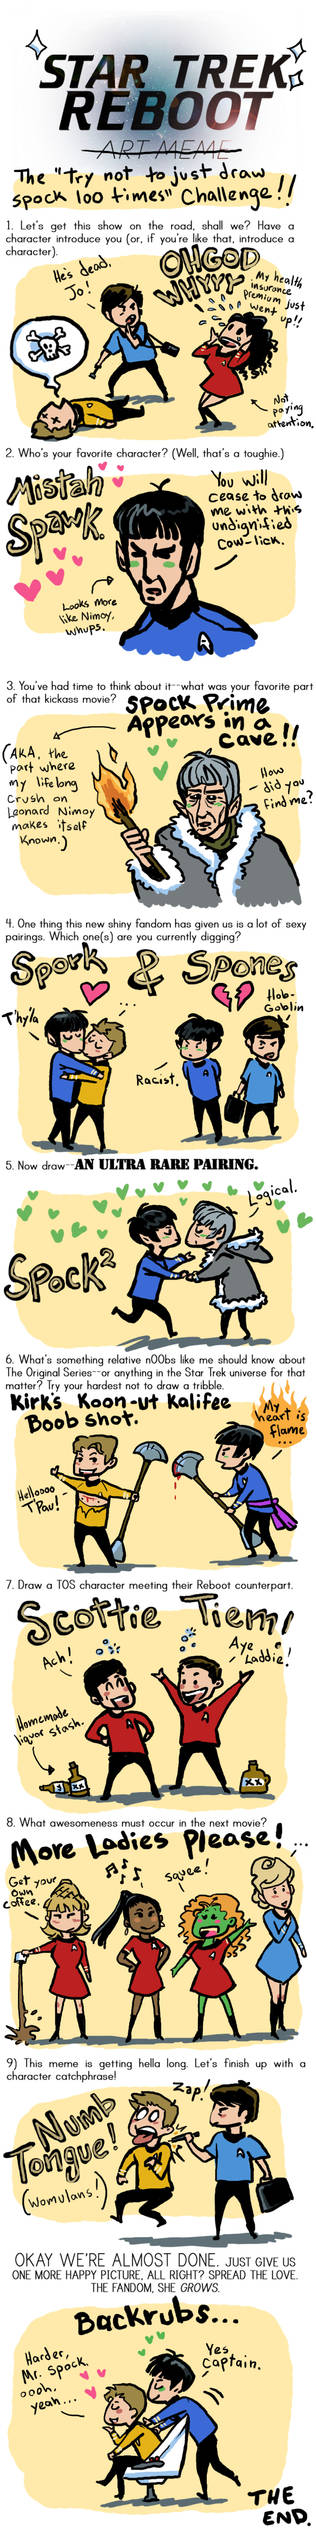 Star Trek Reboot Art Meme